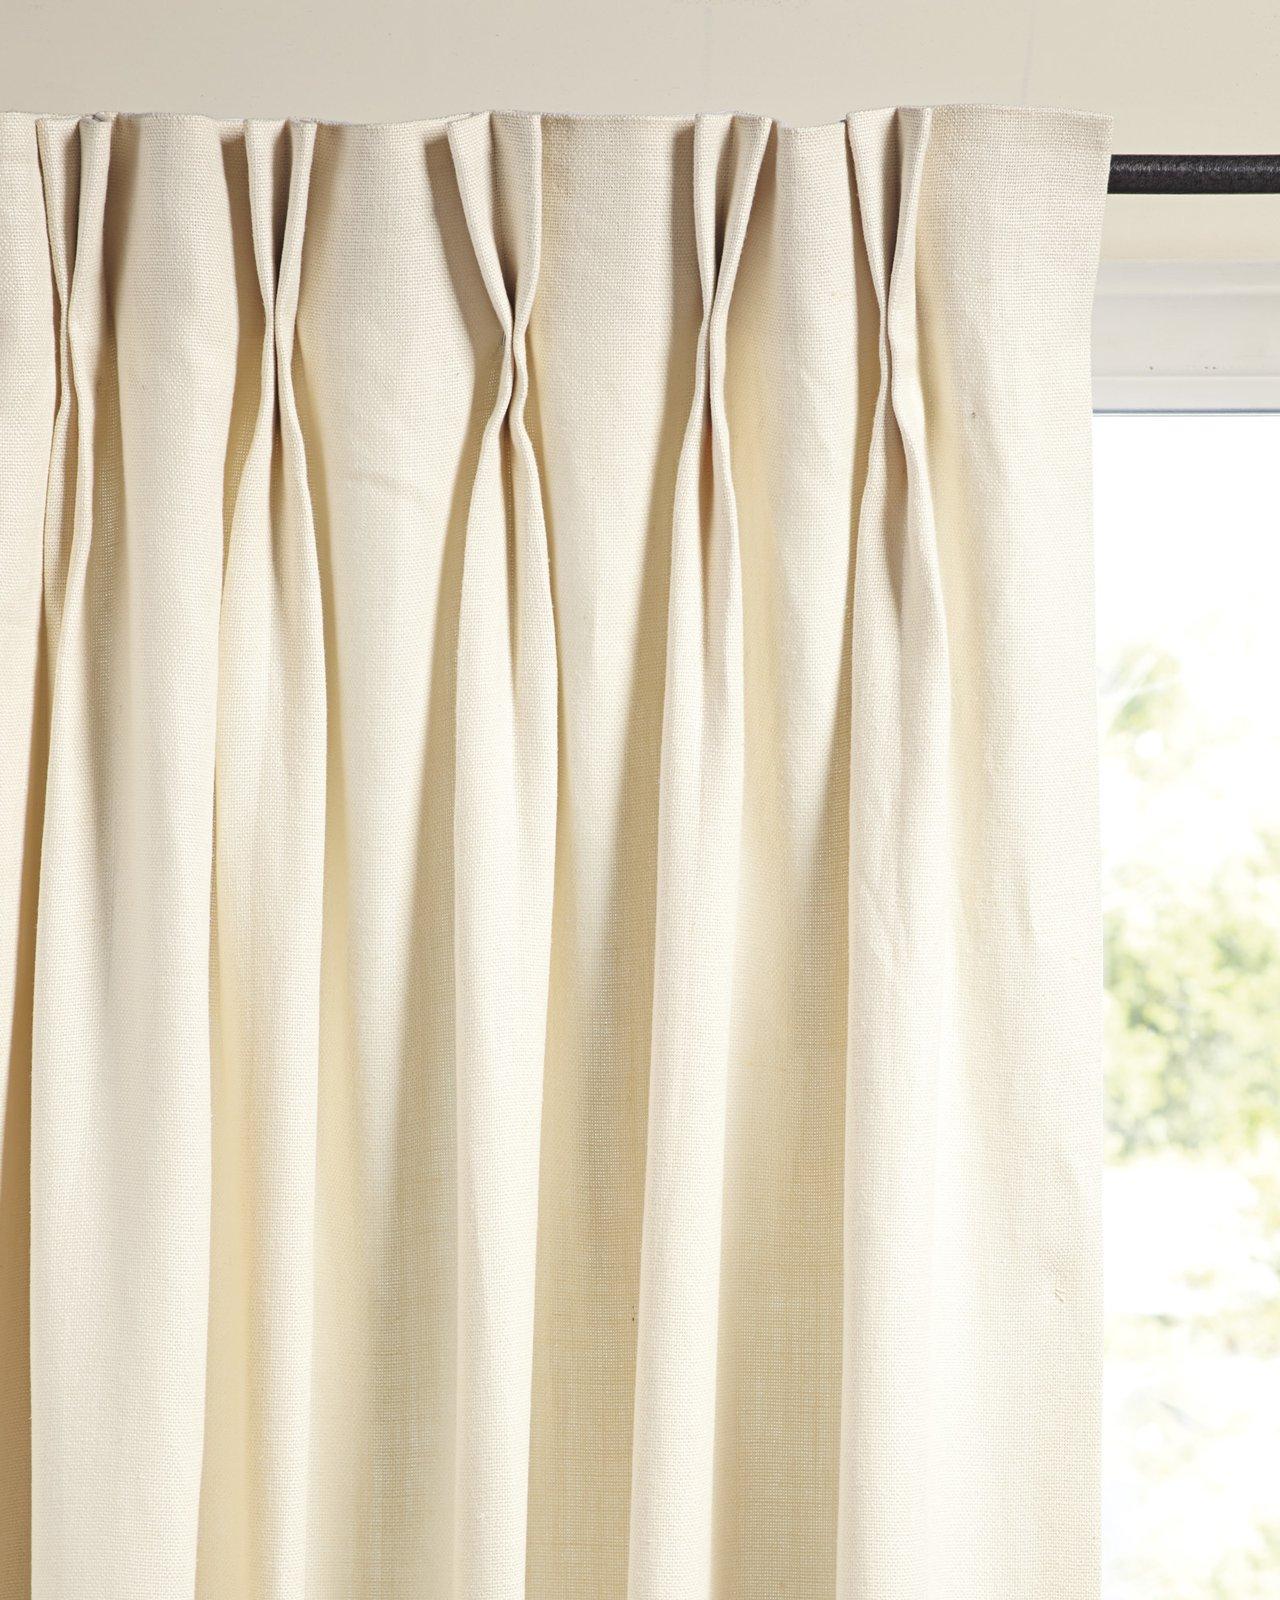 Serena & Lily Palmer Linen Window Panel ($150)